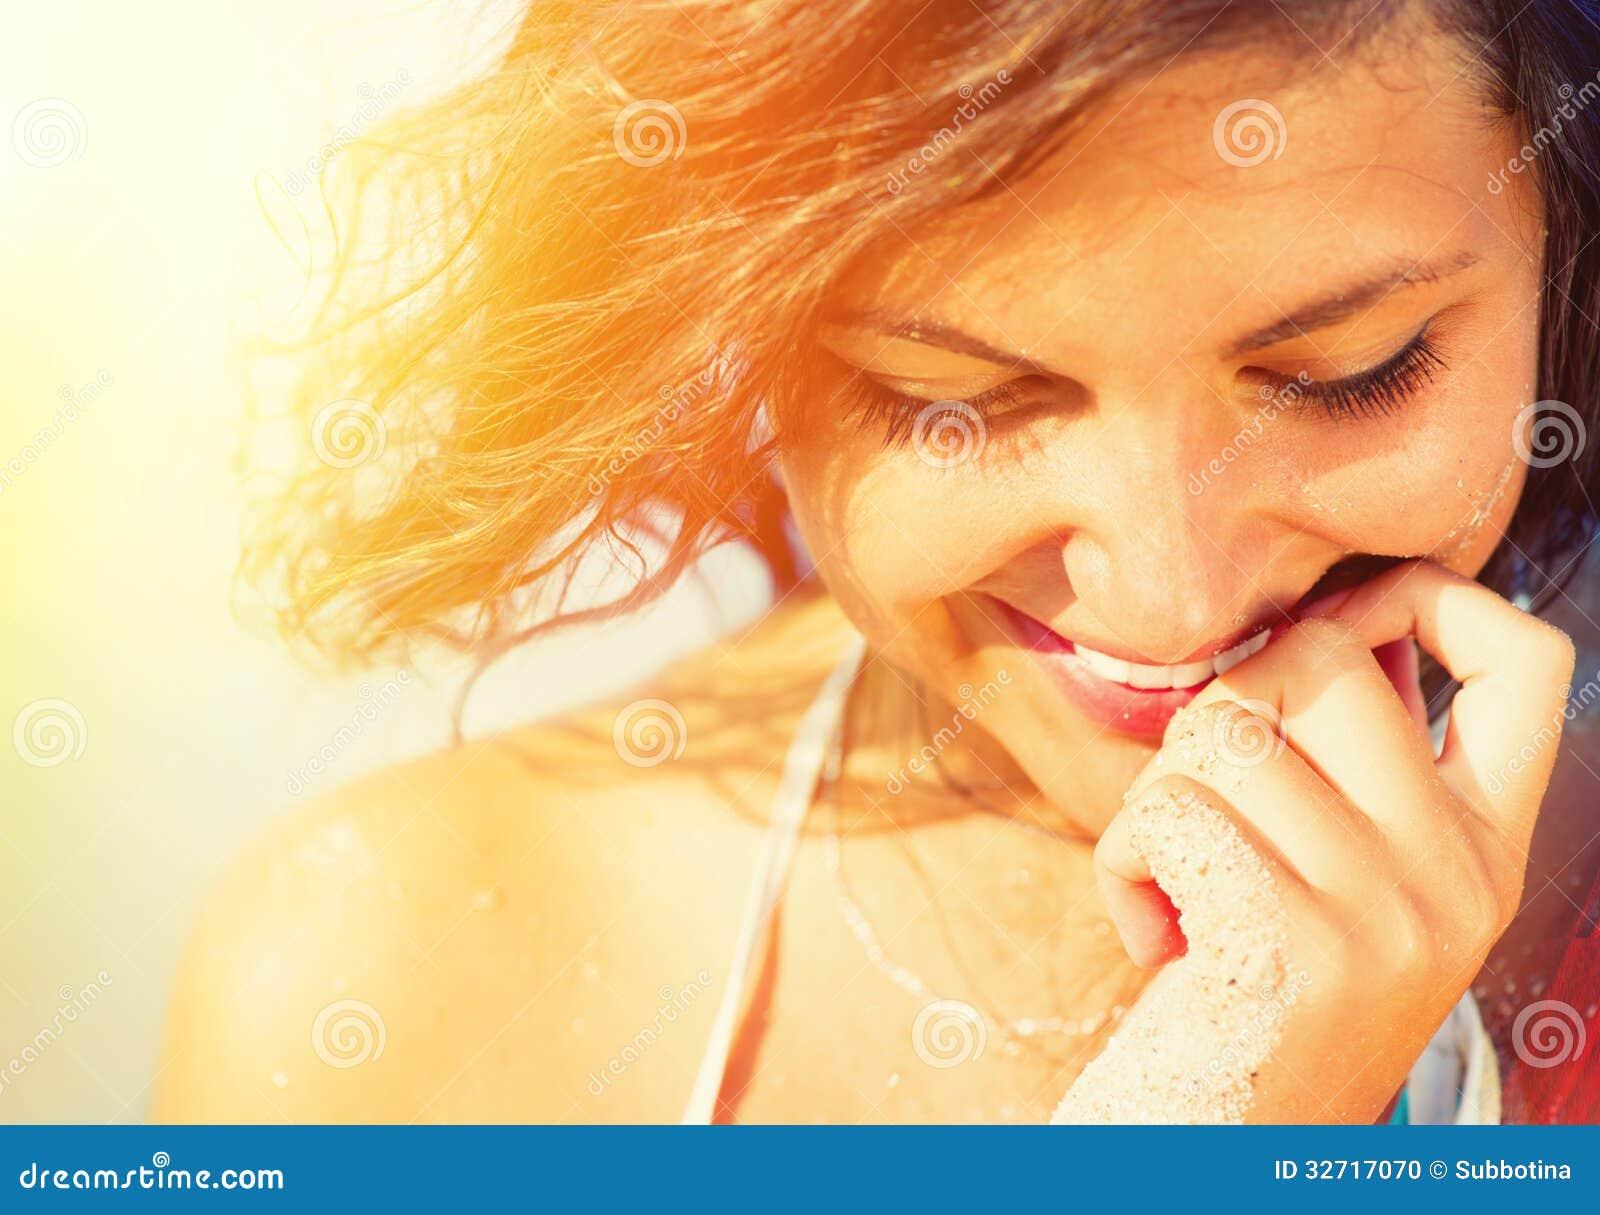 Sunshine Girl Portrait